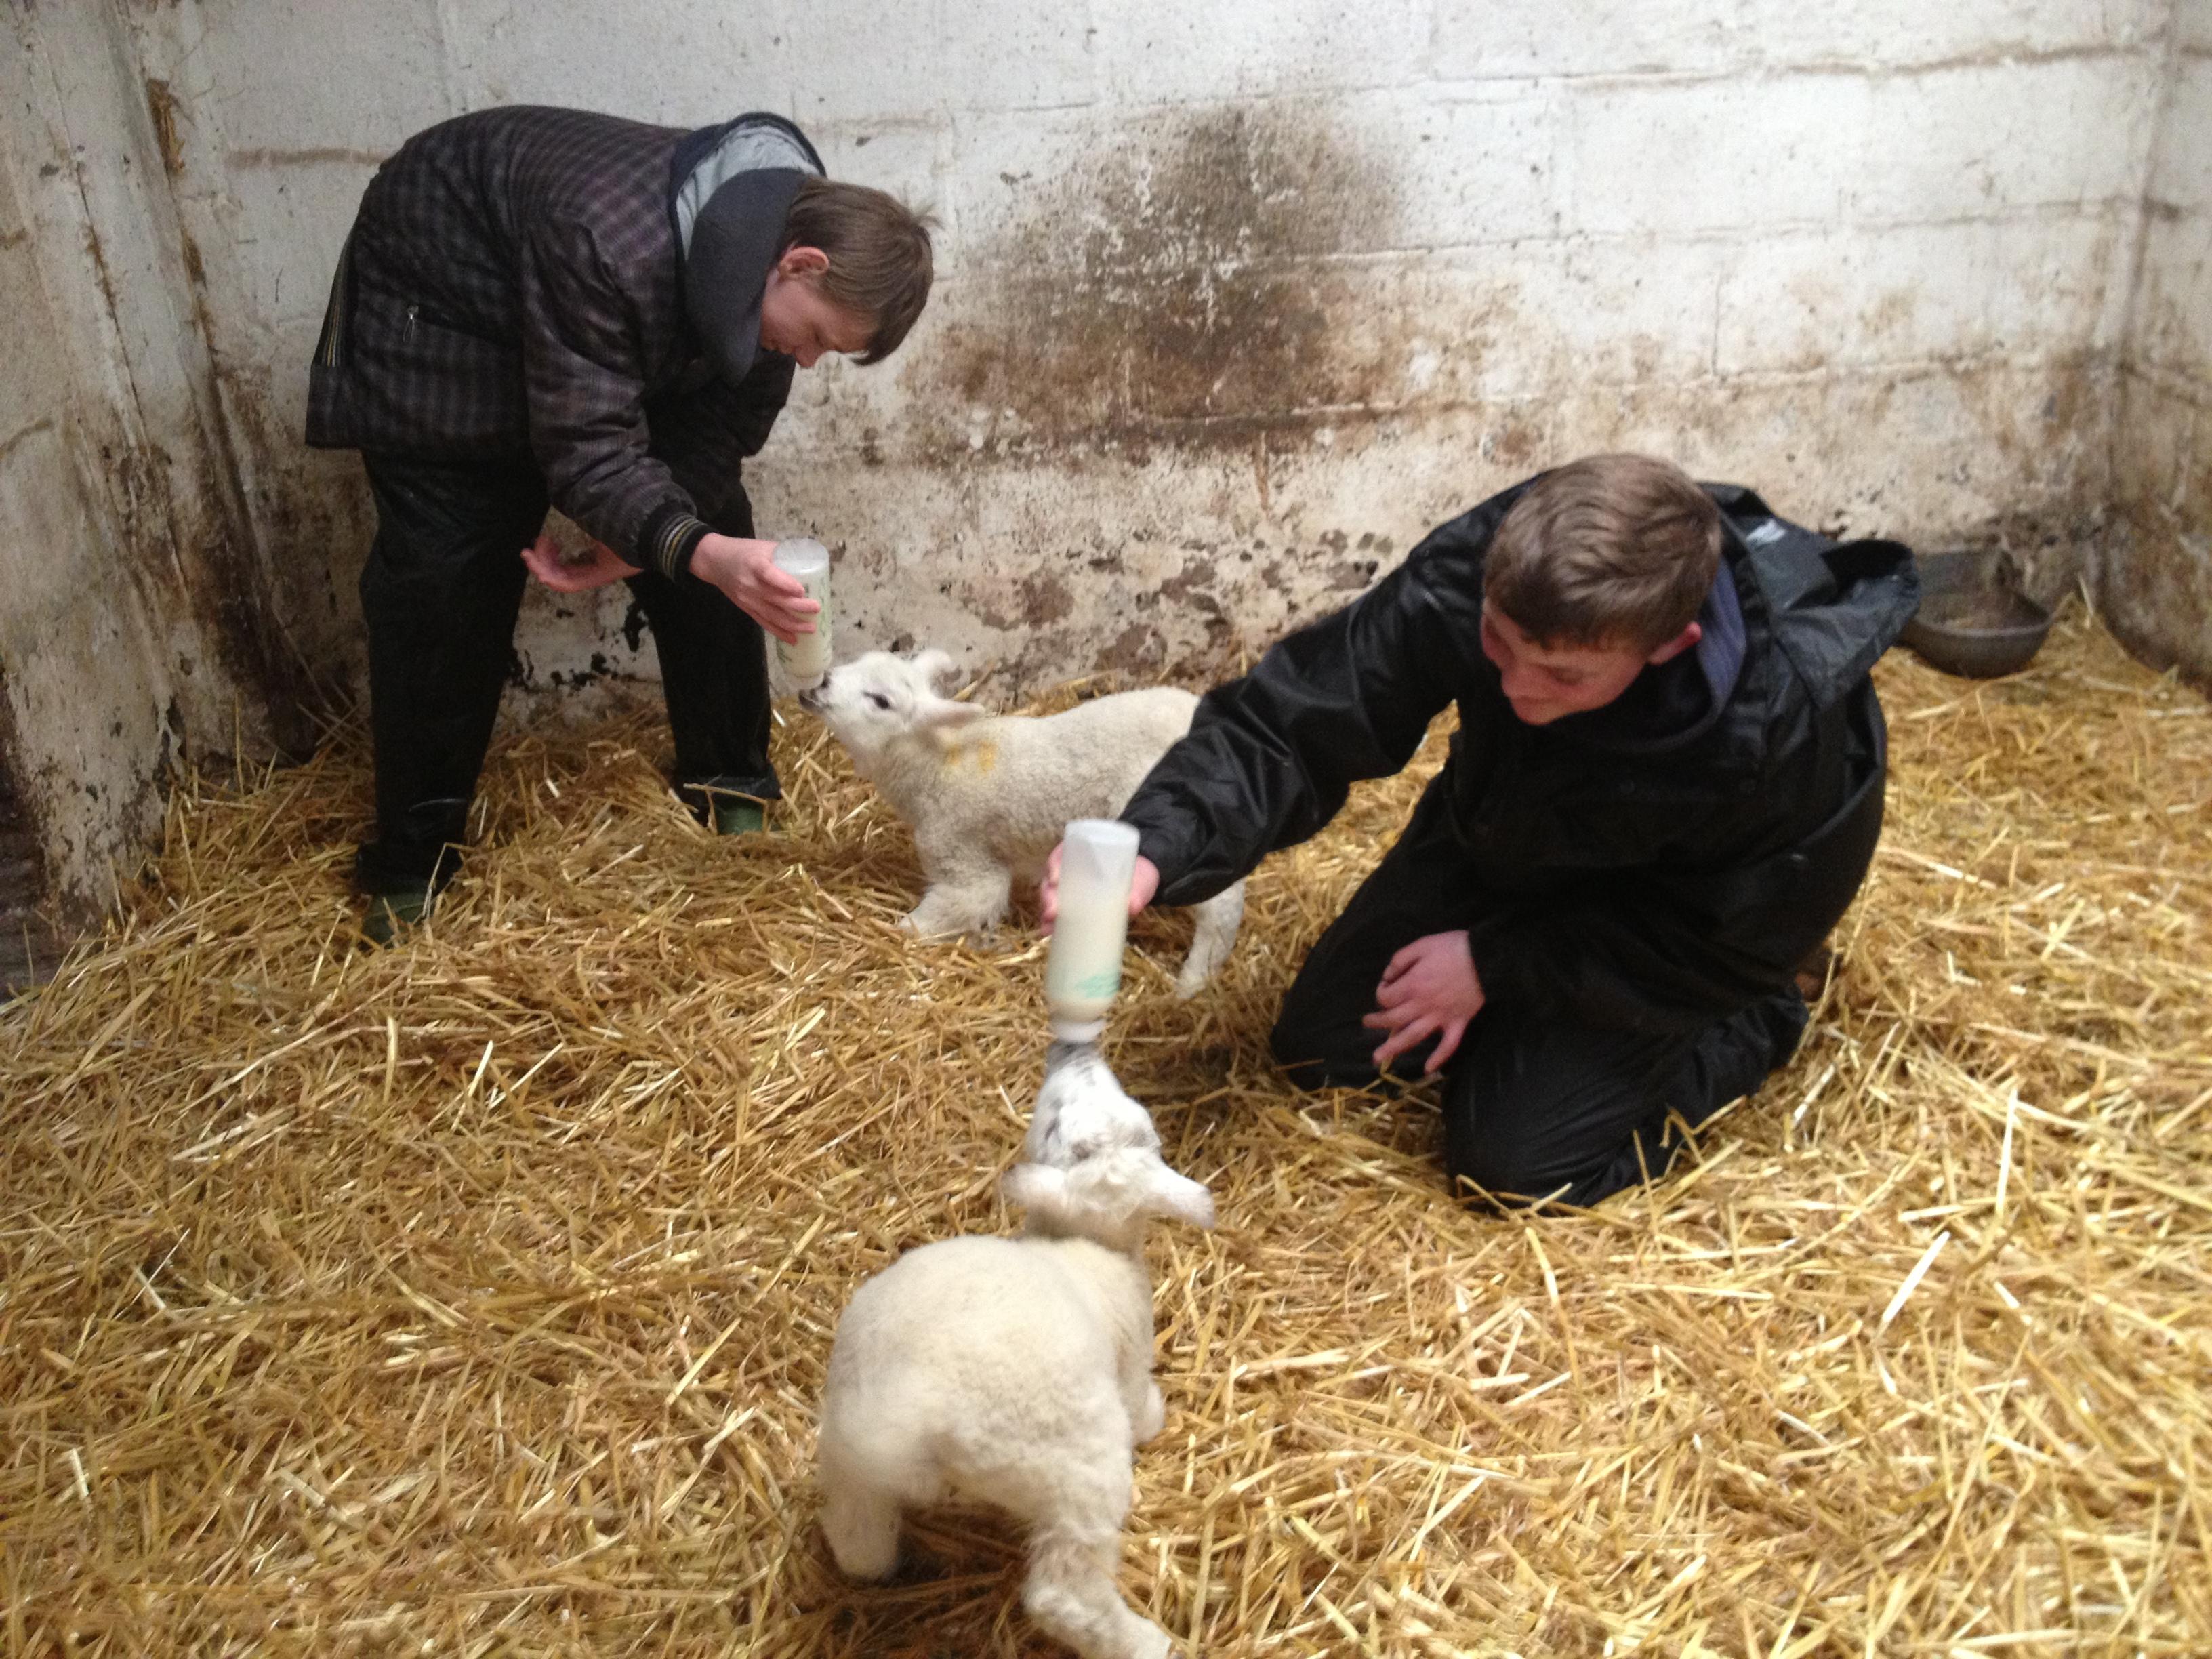 Learning livestock care skills